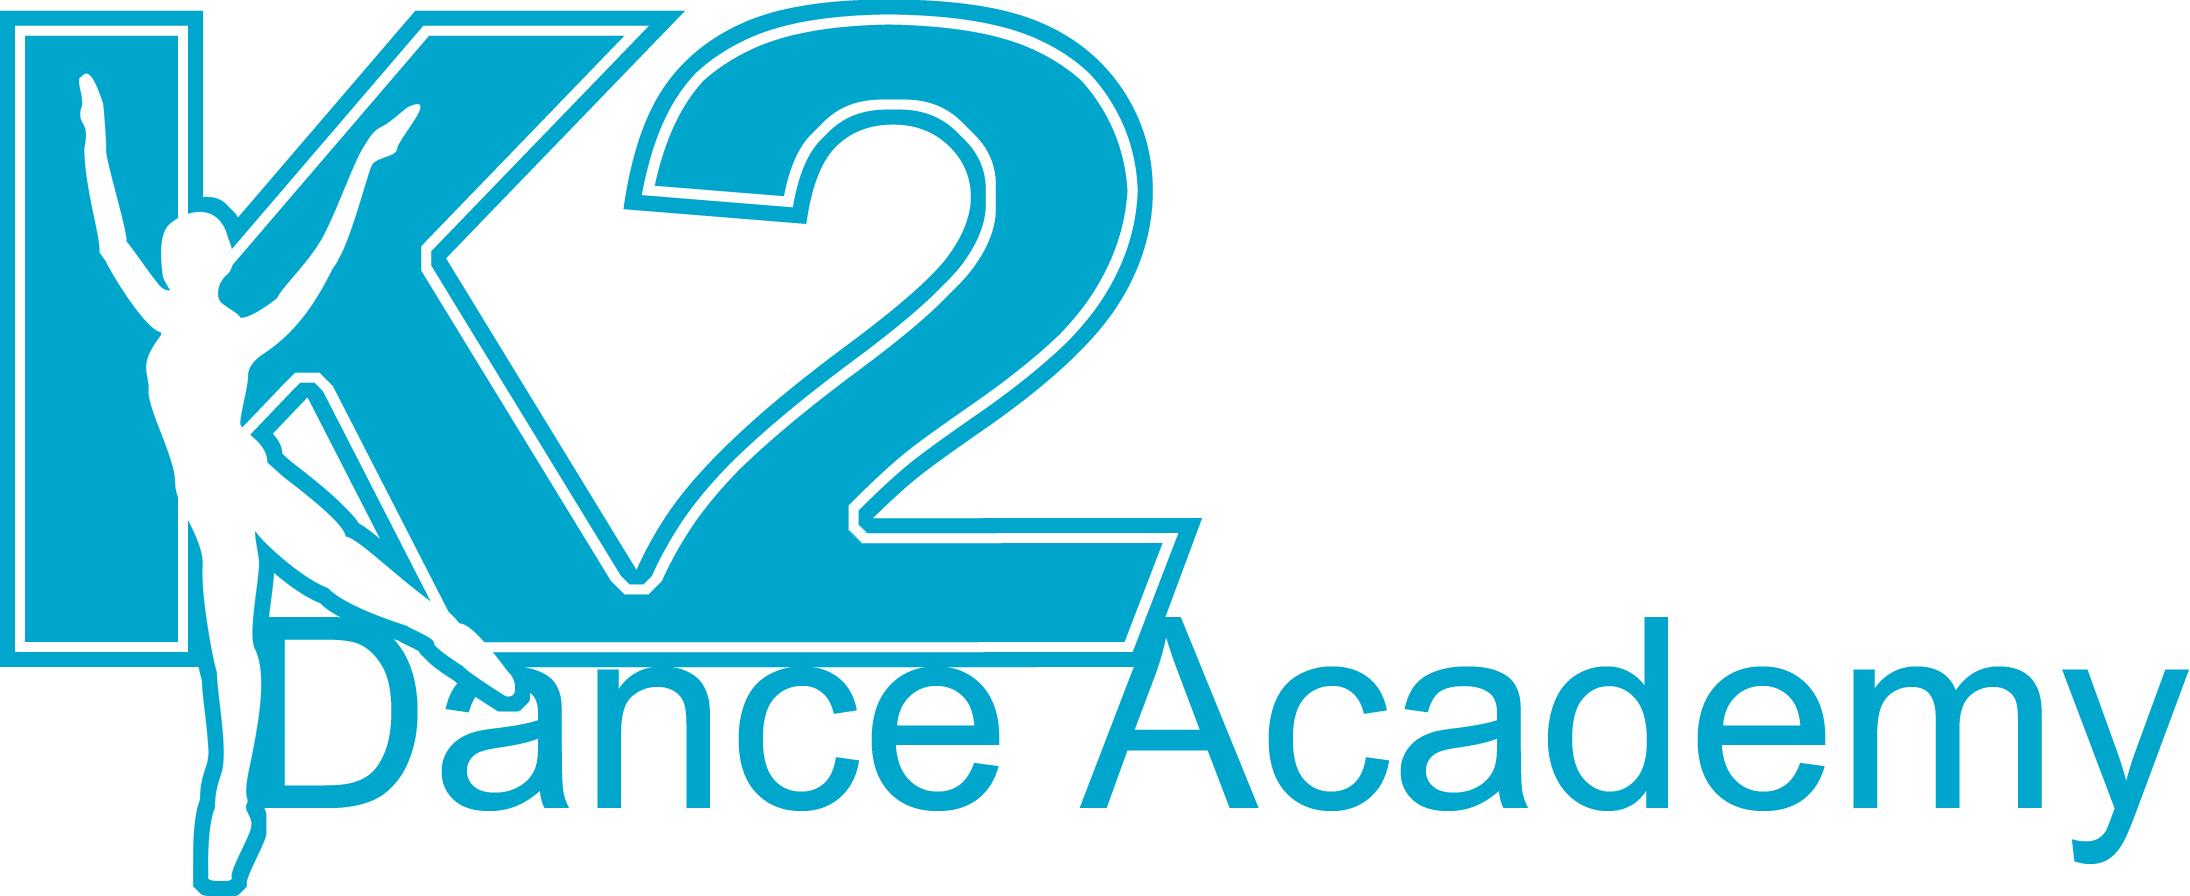 K2 Dance Academy